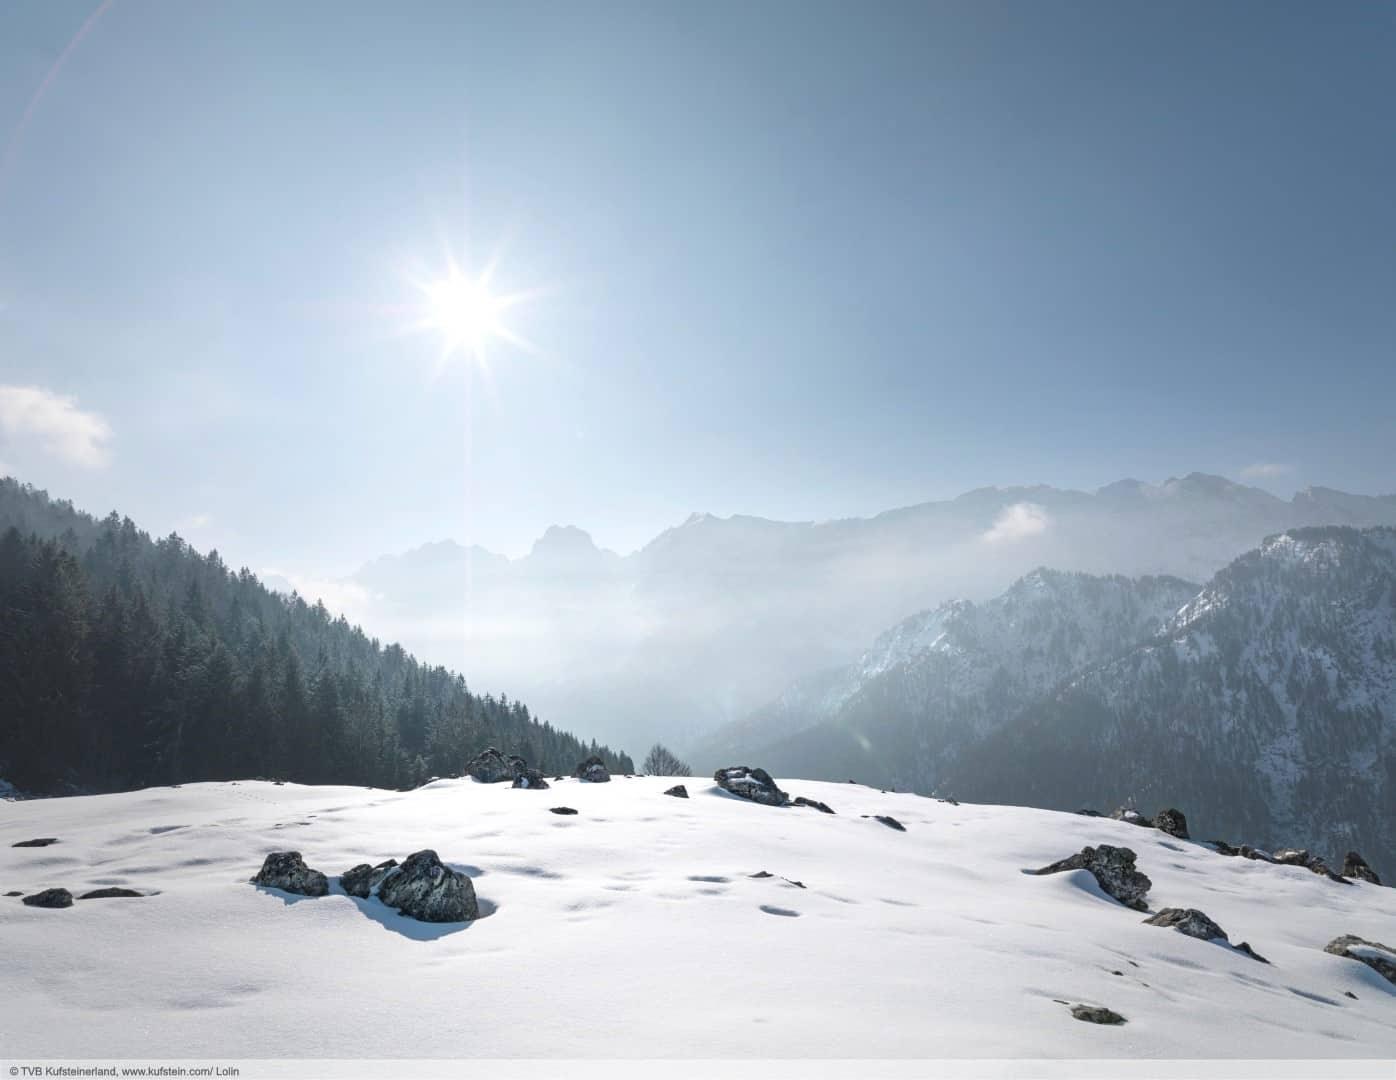 wintersport en aanbiedingen in Thiersee